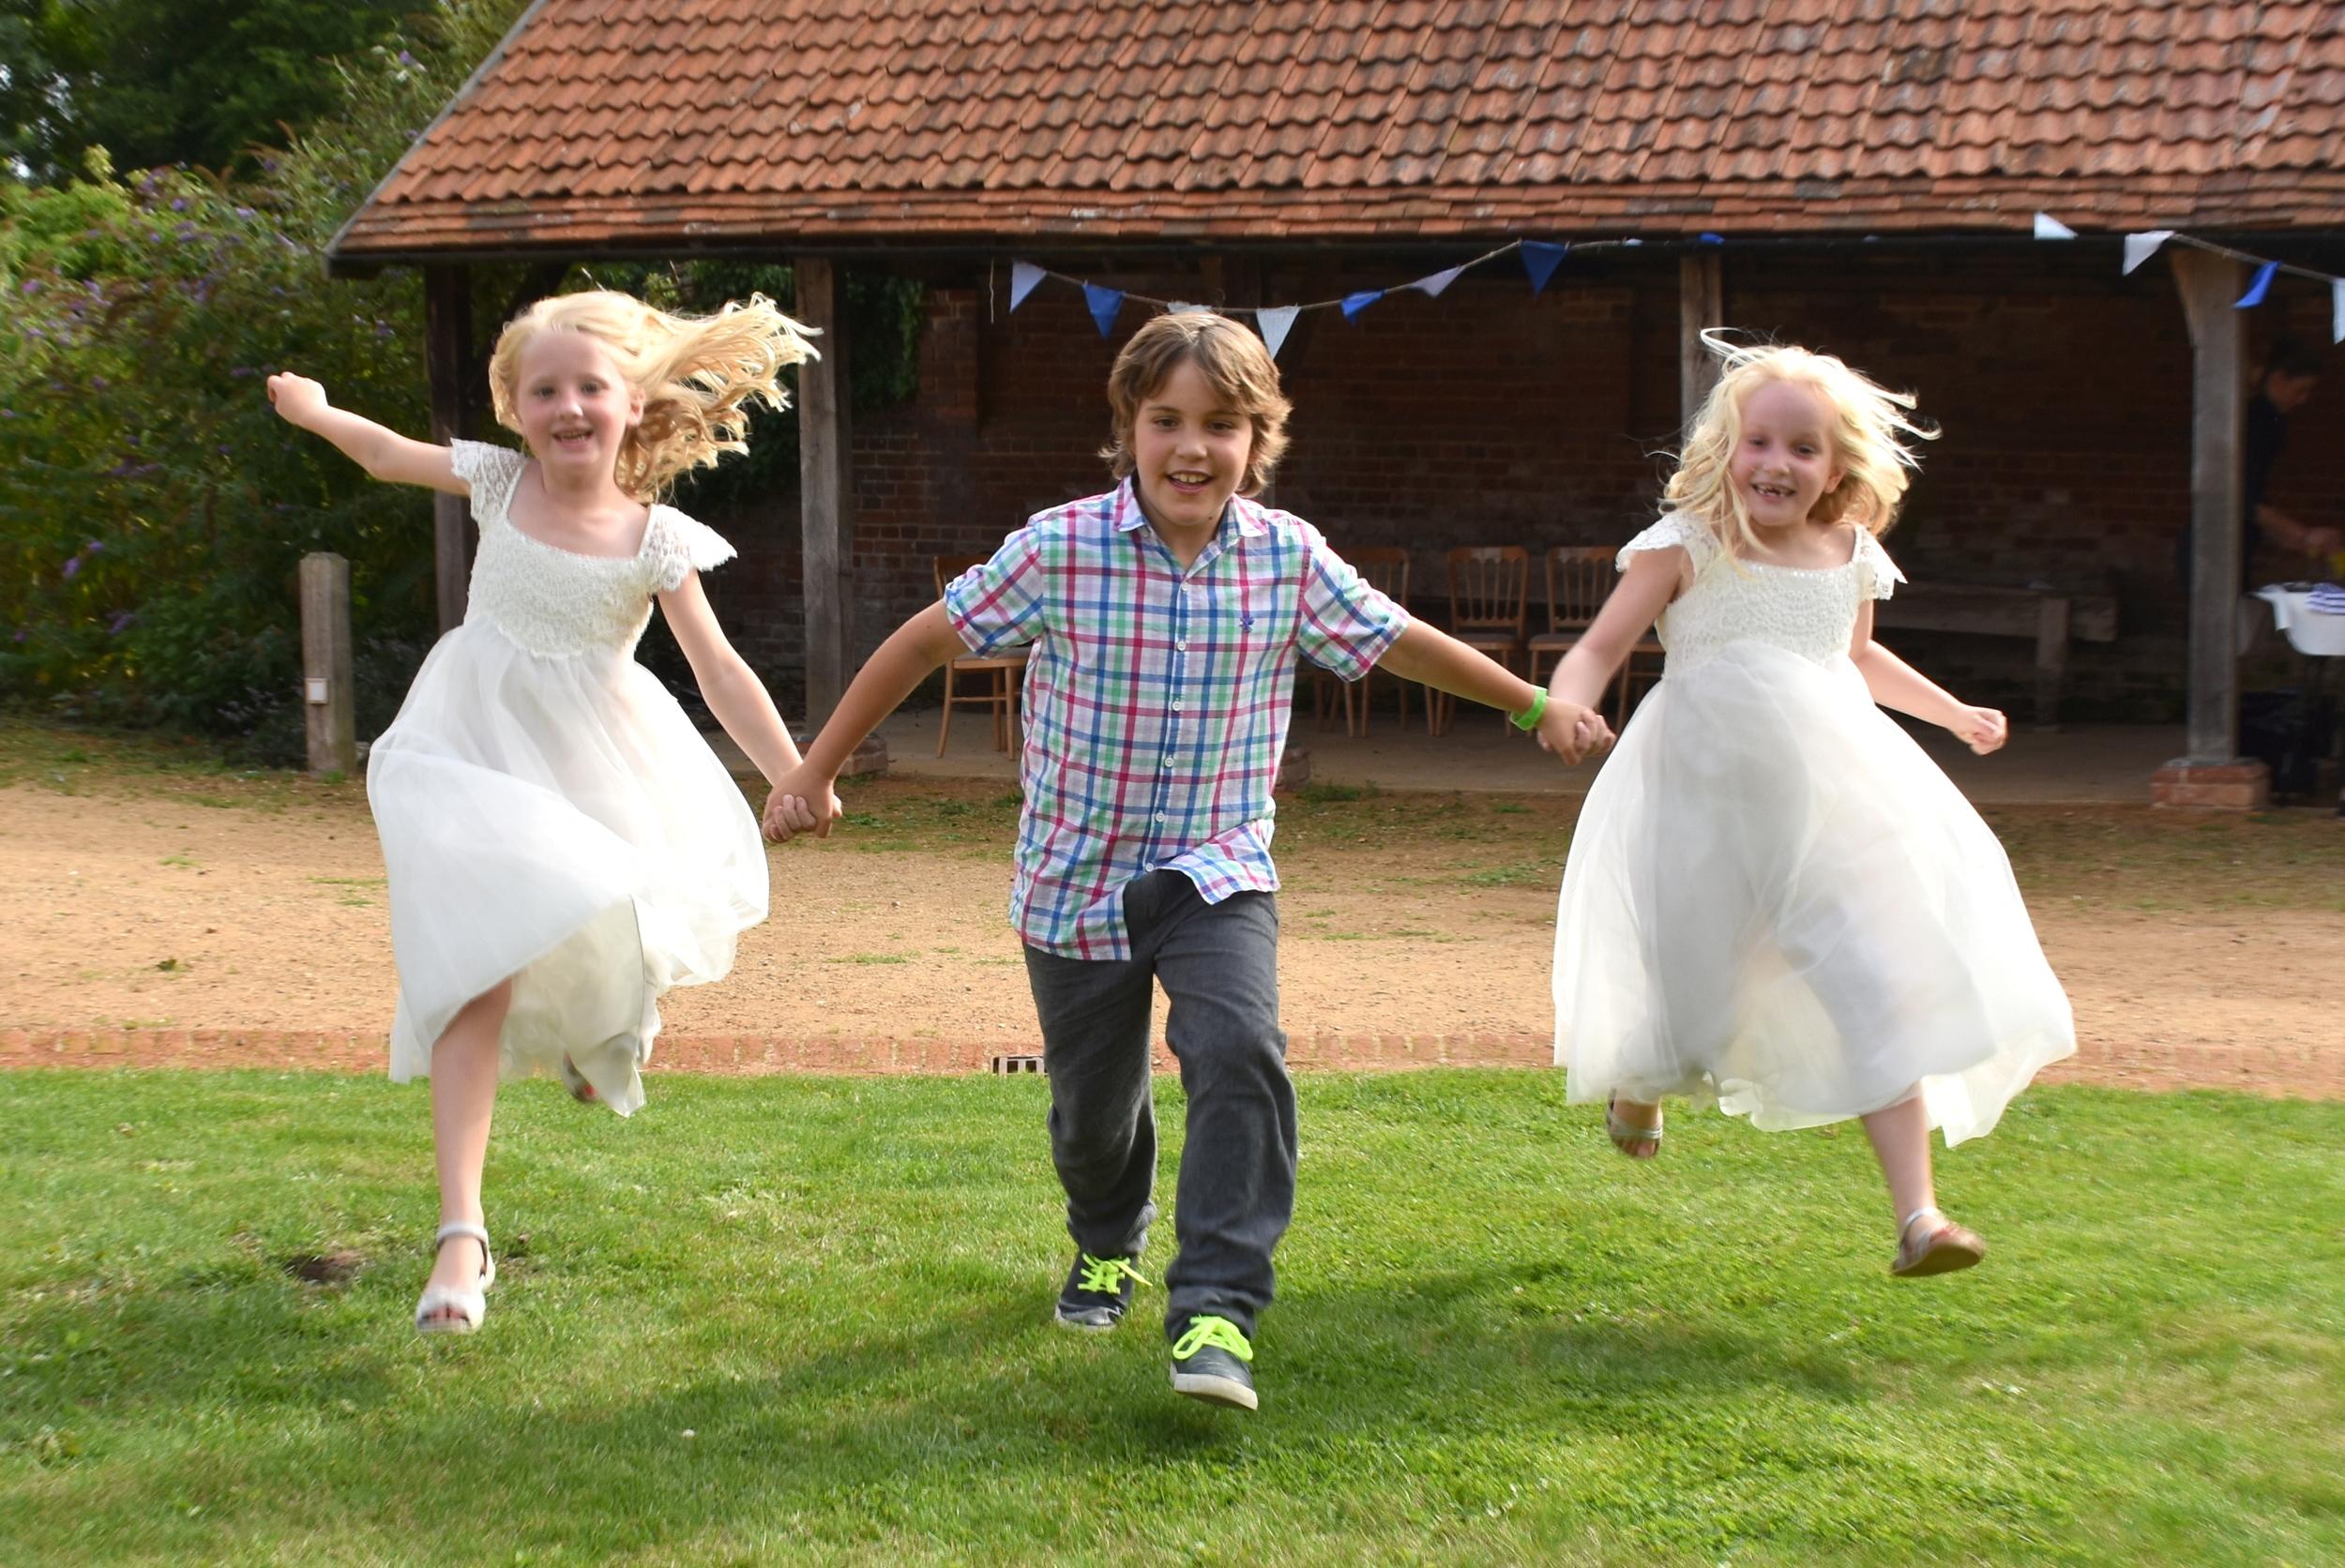 Children enjoying the day at Basing Barn, near Basingstoke